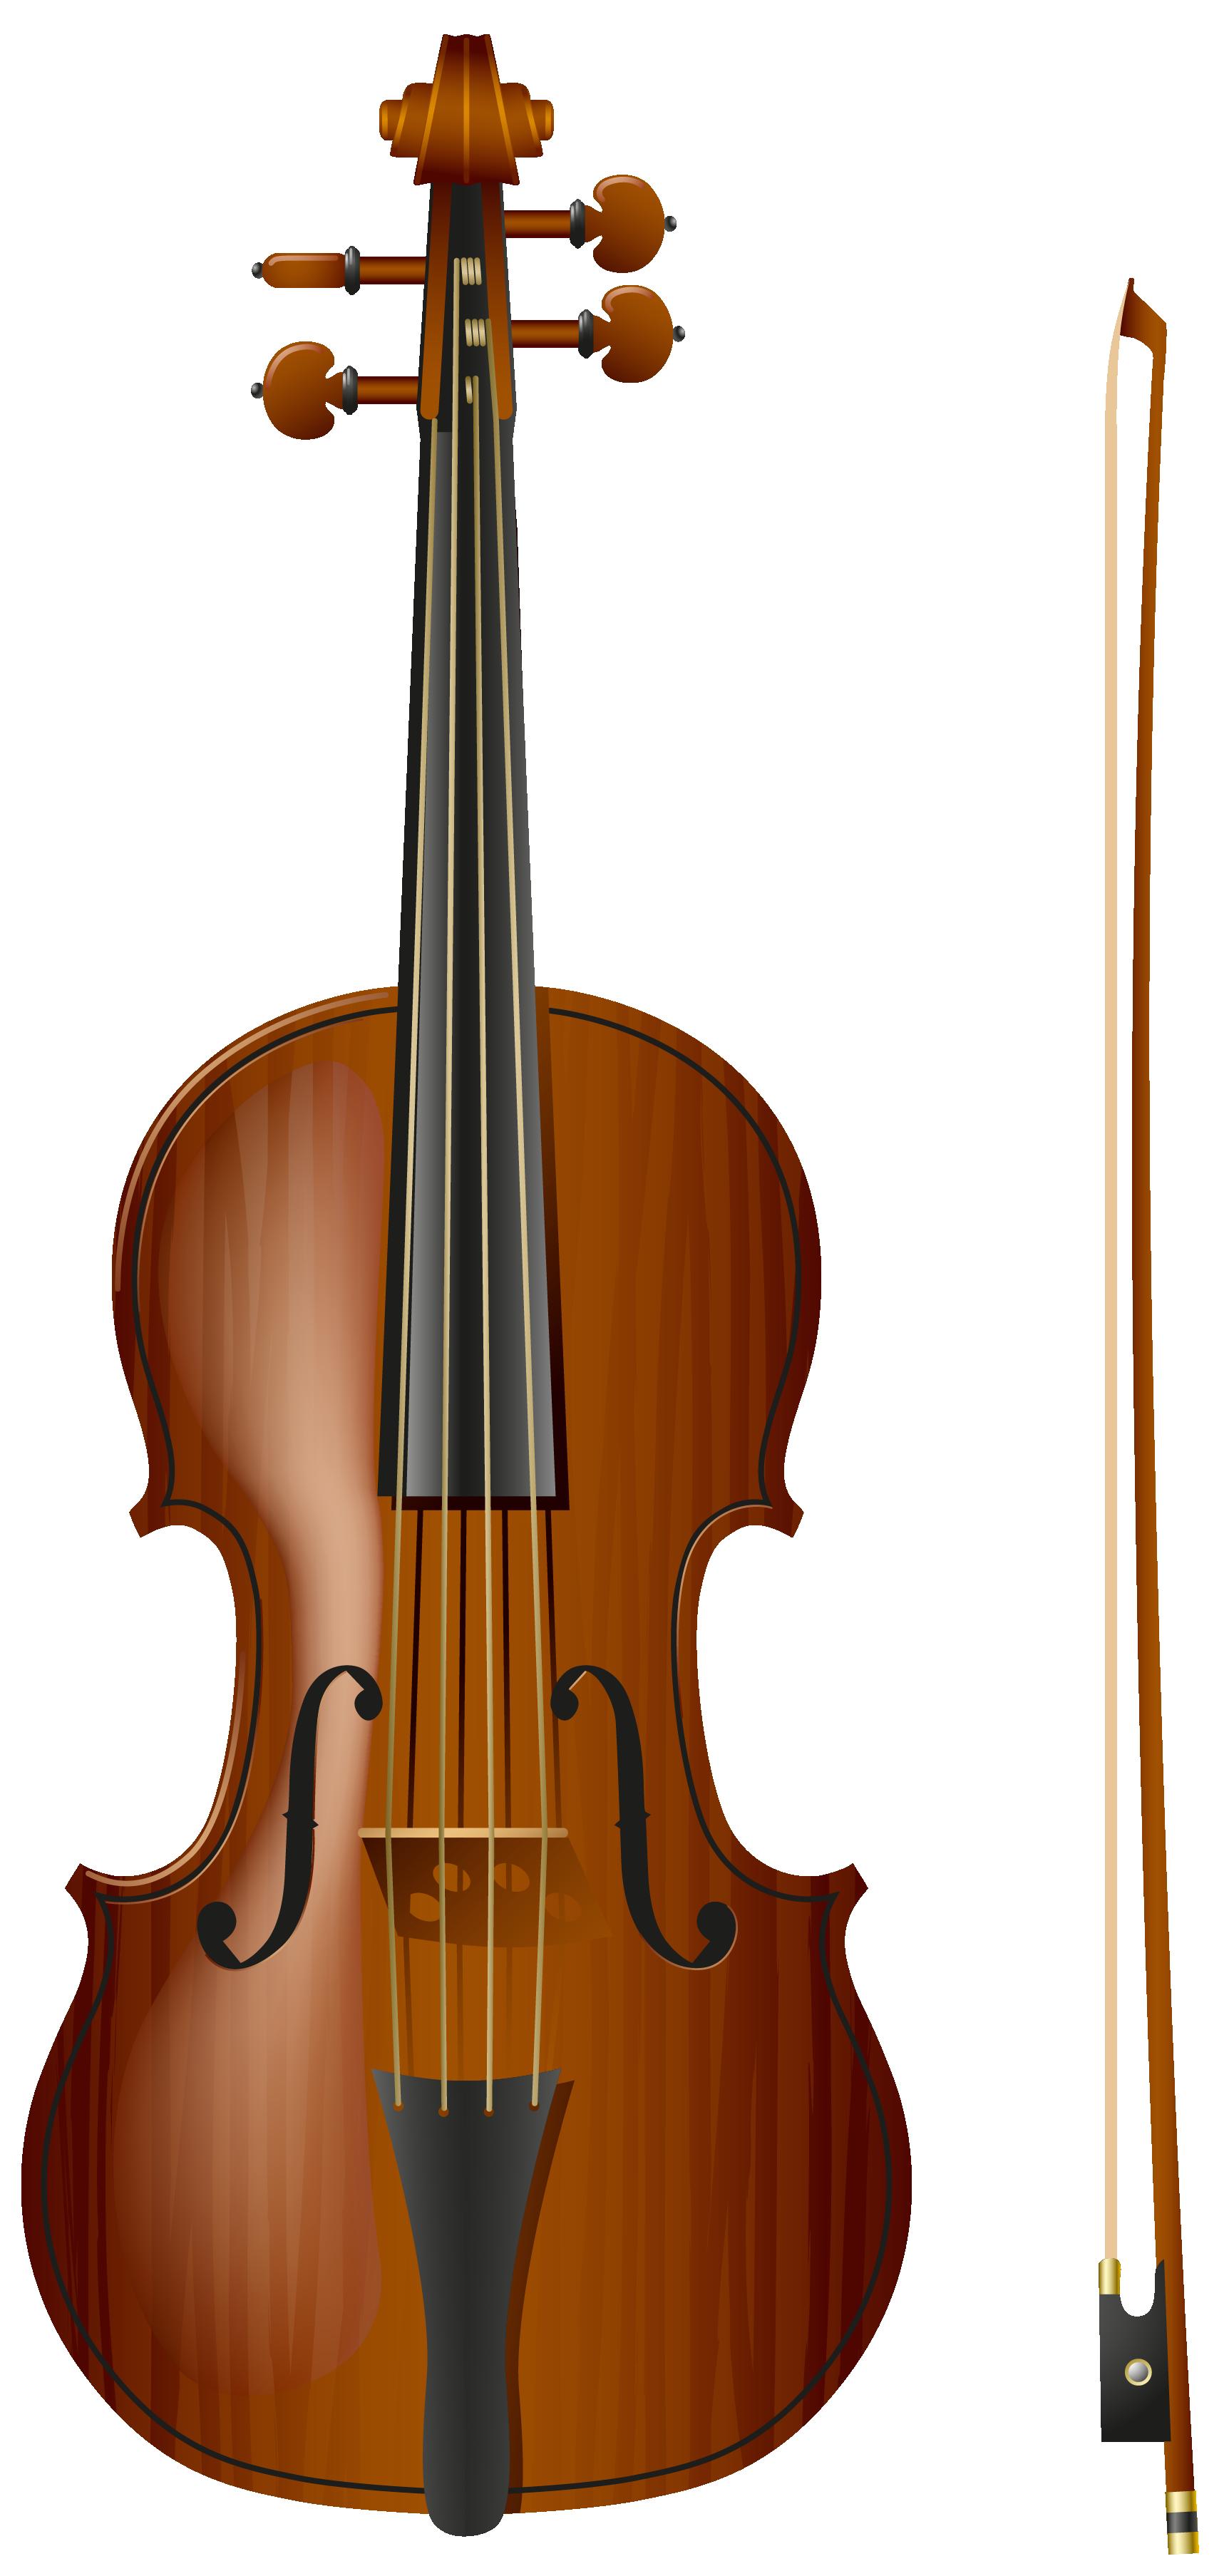 Violin Png Picture Gallery Yopriceville High Quality Images And Transparent Png Free Clipart Cara Menggambar Biola Bentuk